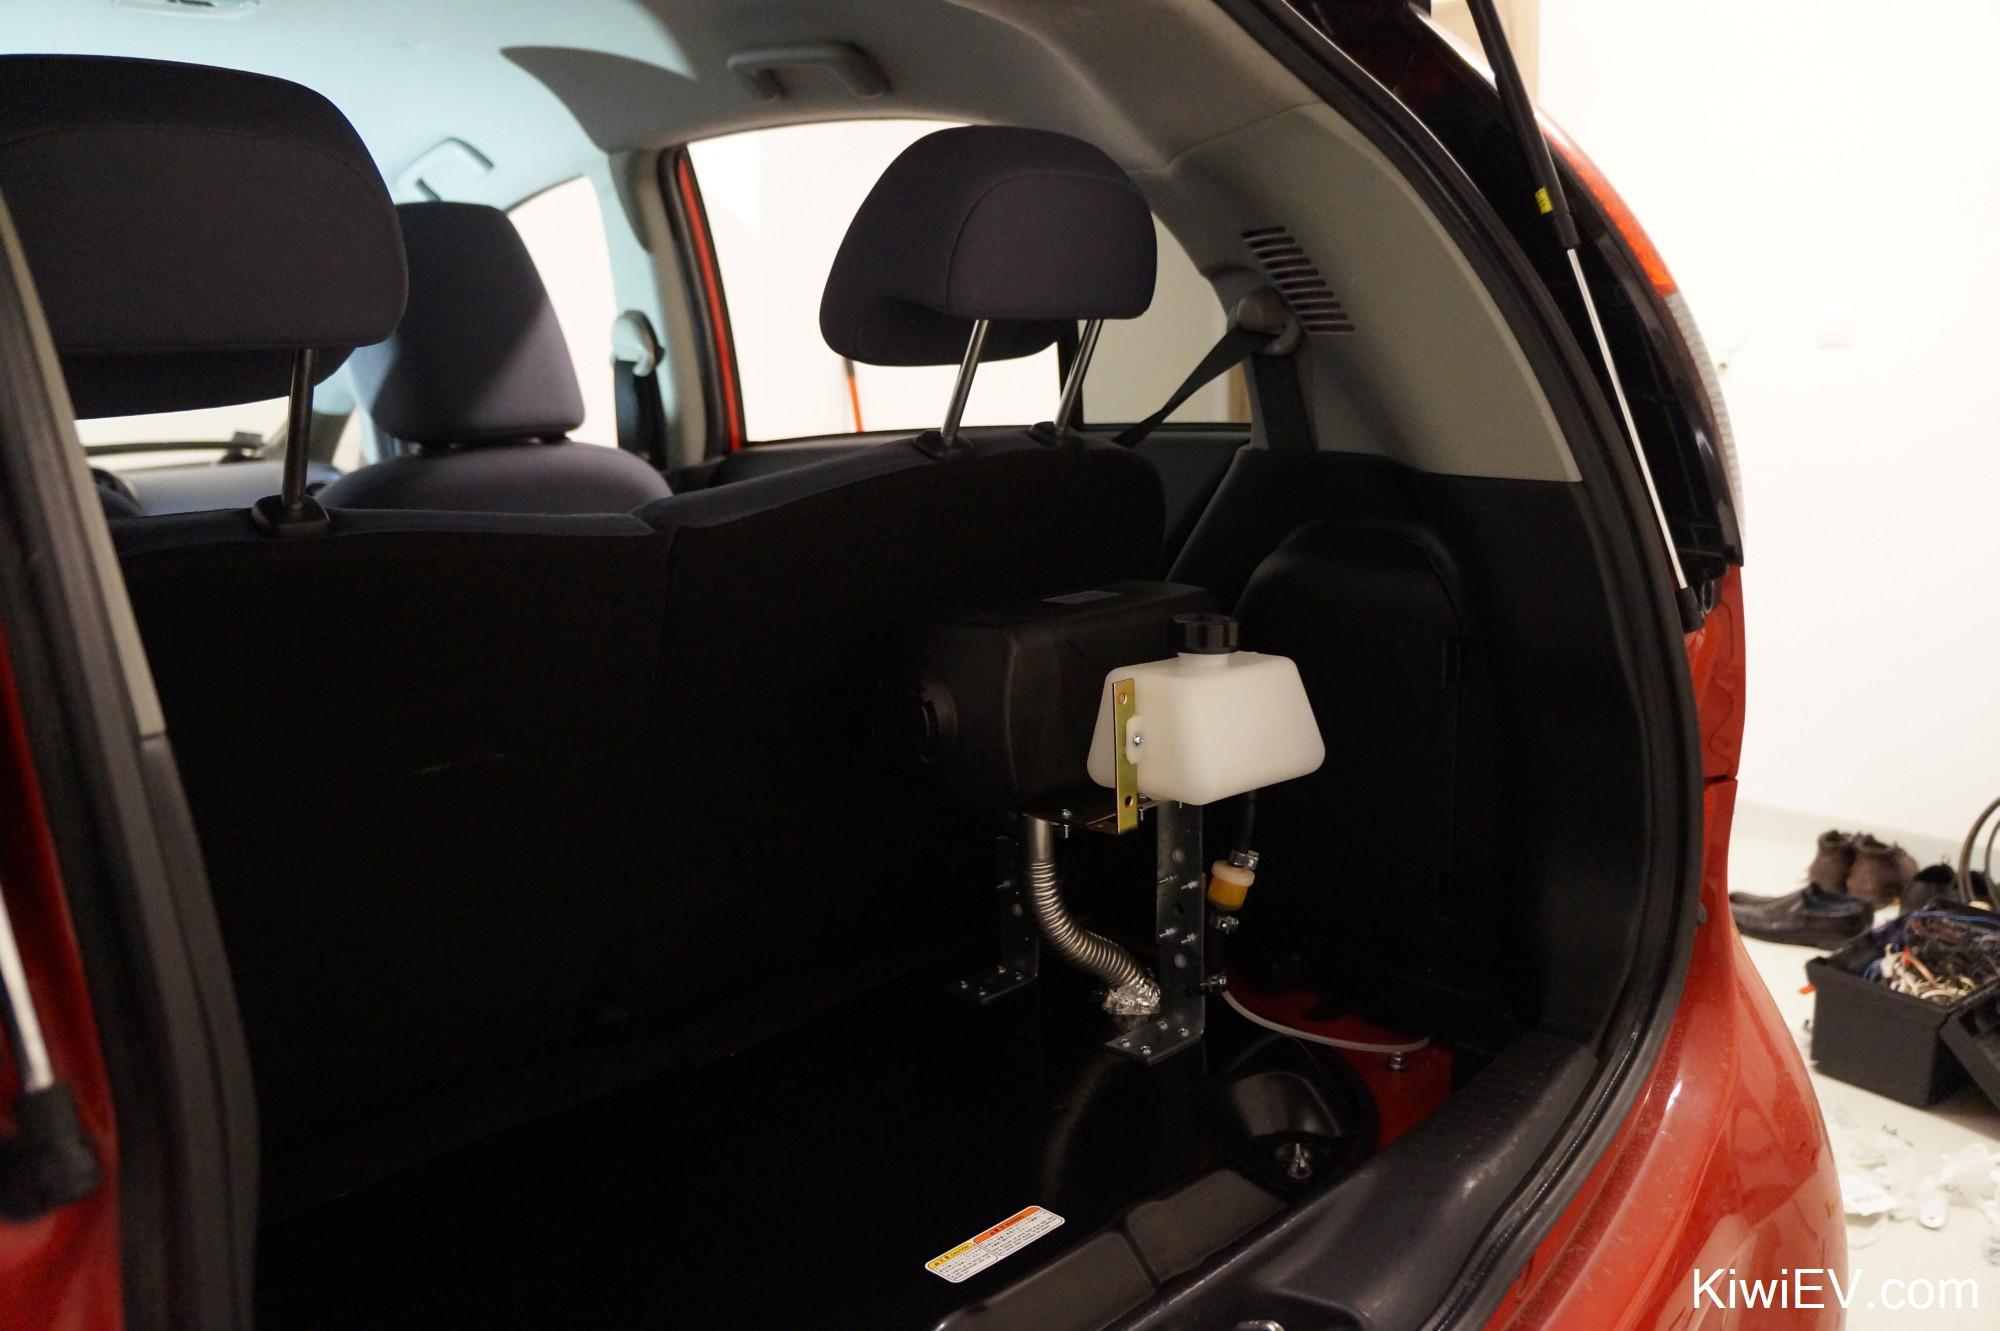 Installing A Diesel Parking Heater In My Electric Car Evs Alarm Wiring Diagram 2 Testing